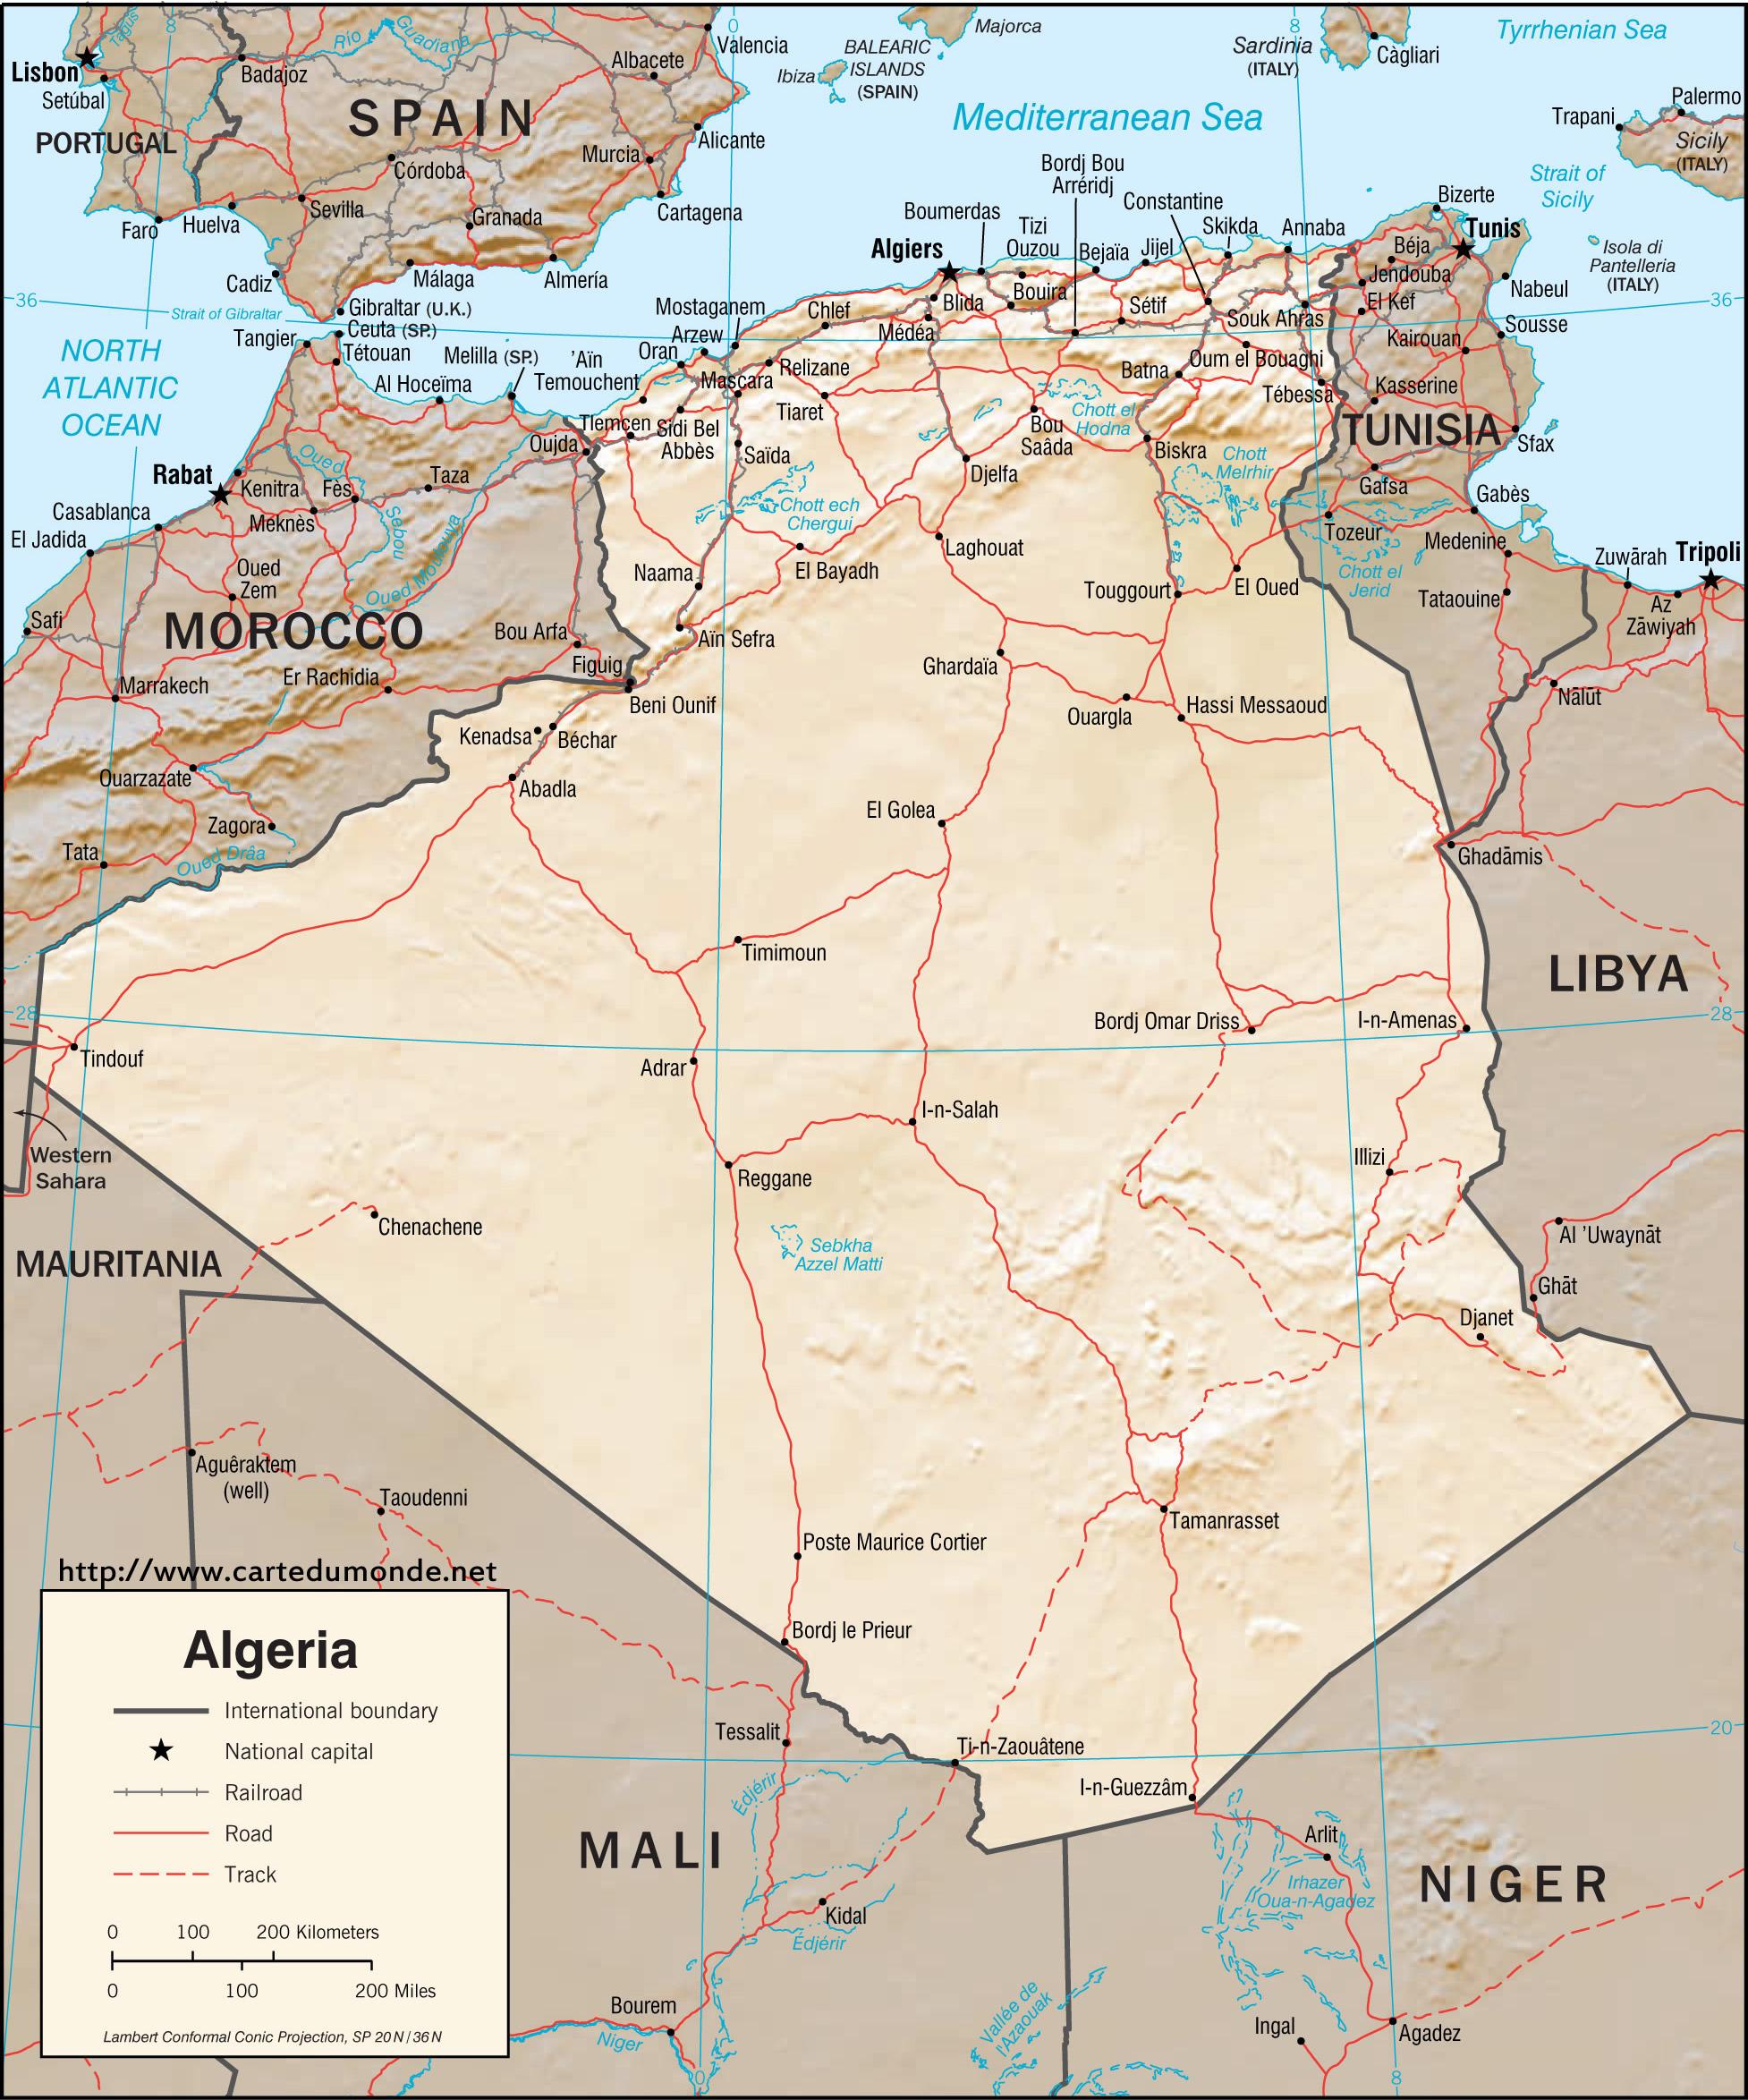 Algerie Carte Du Monde.Grande Carte Algerie Sur Carte Du Monde